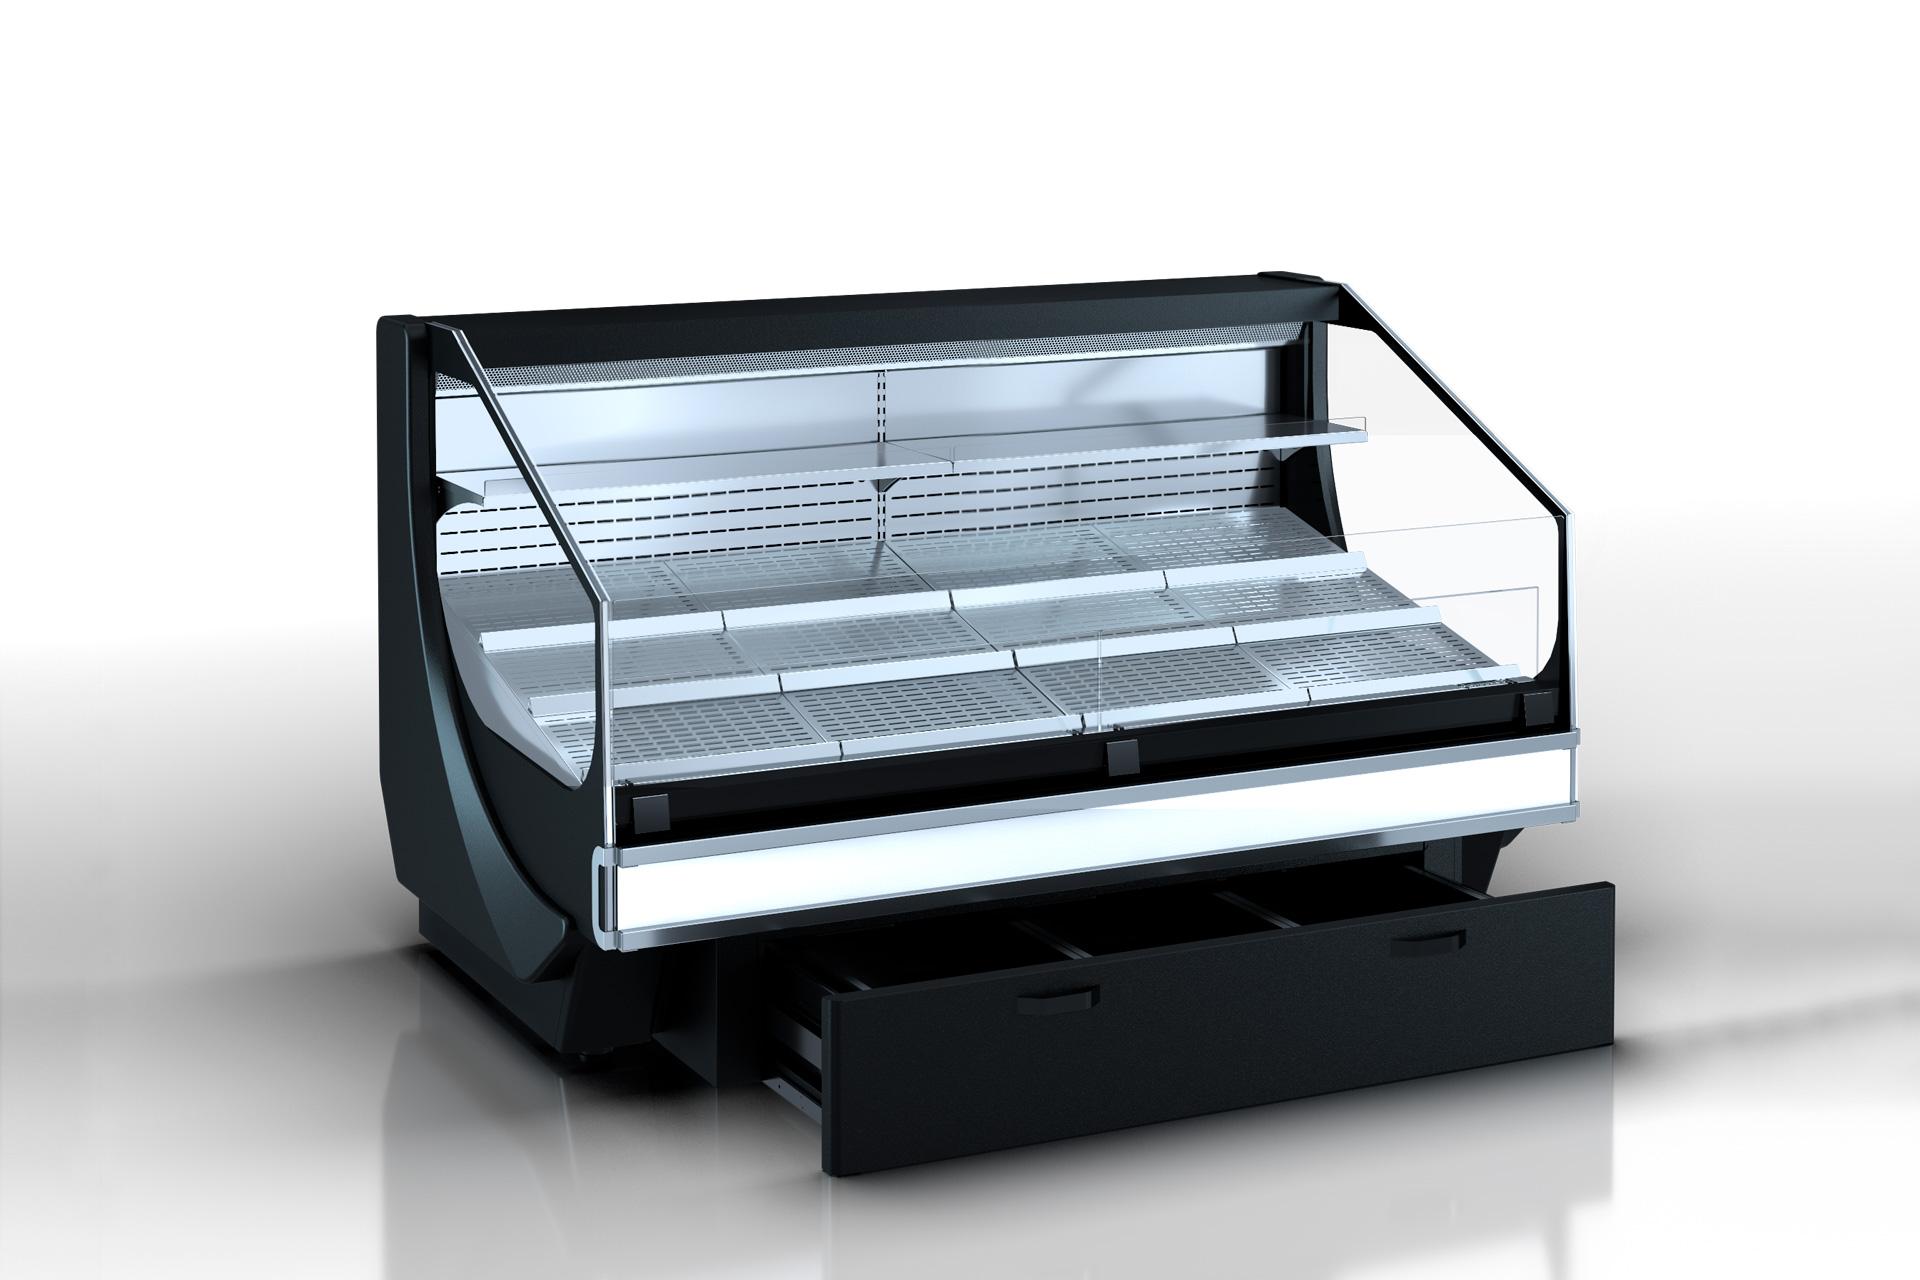 Lady chłodnicze chłodnicze Missouri cold diamond MC 115 cascade VF self 121-DBA (option)